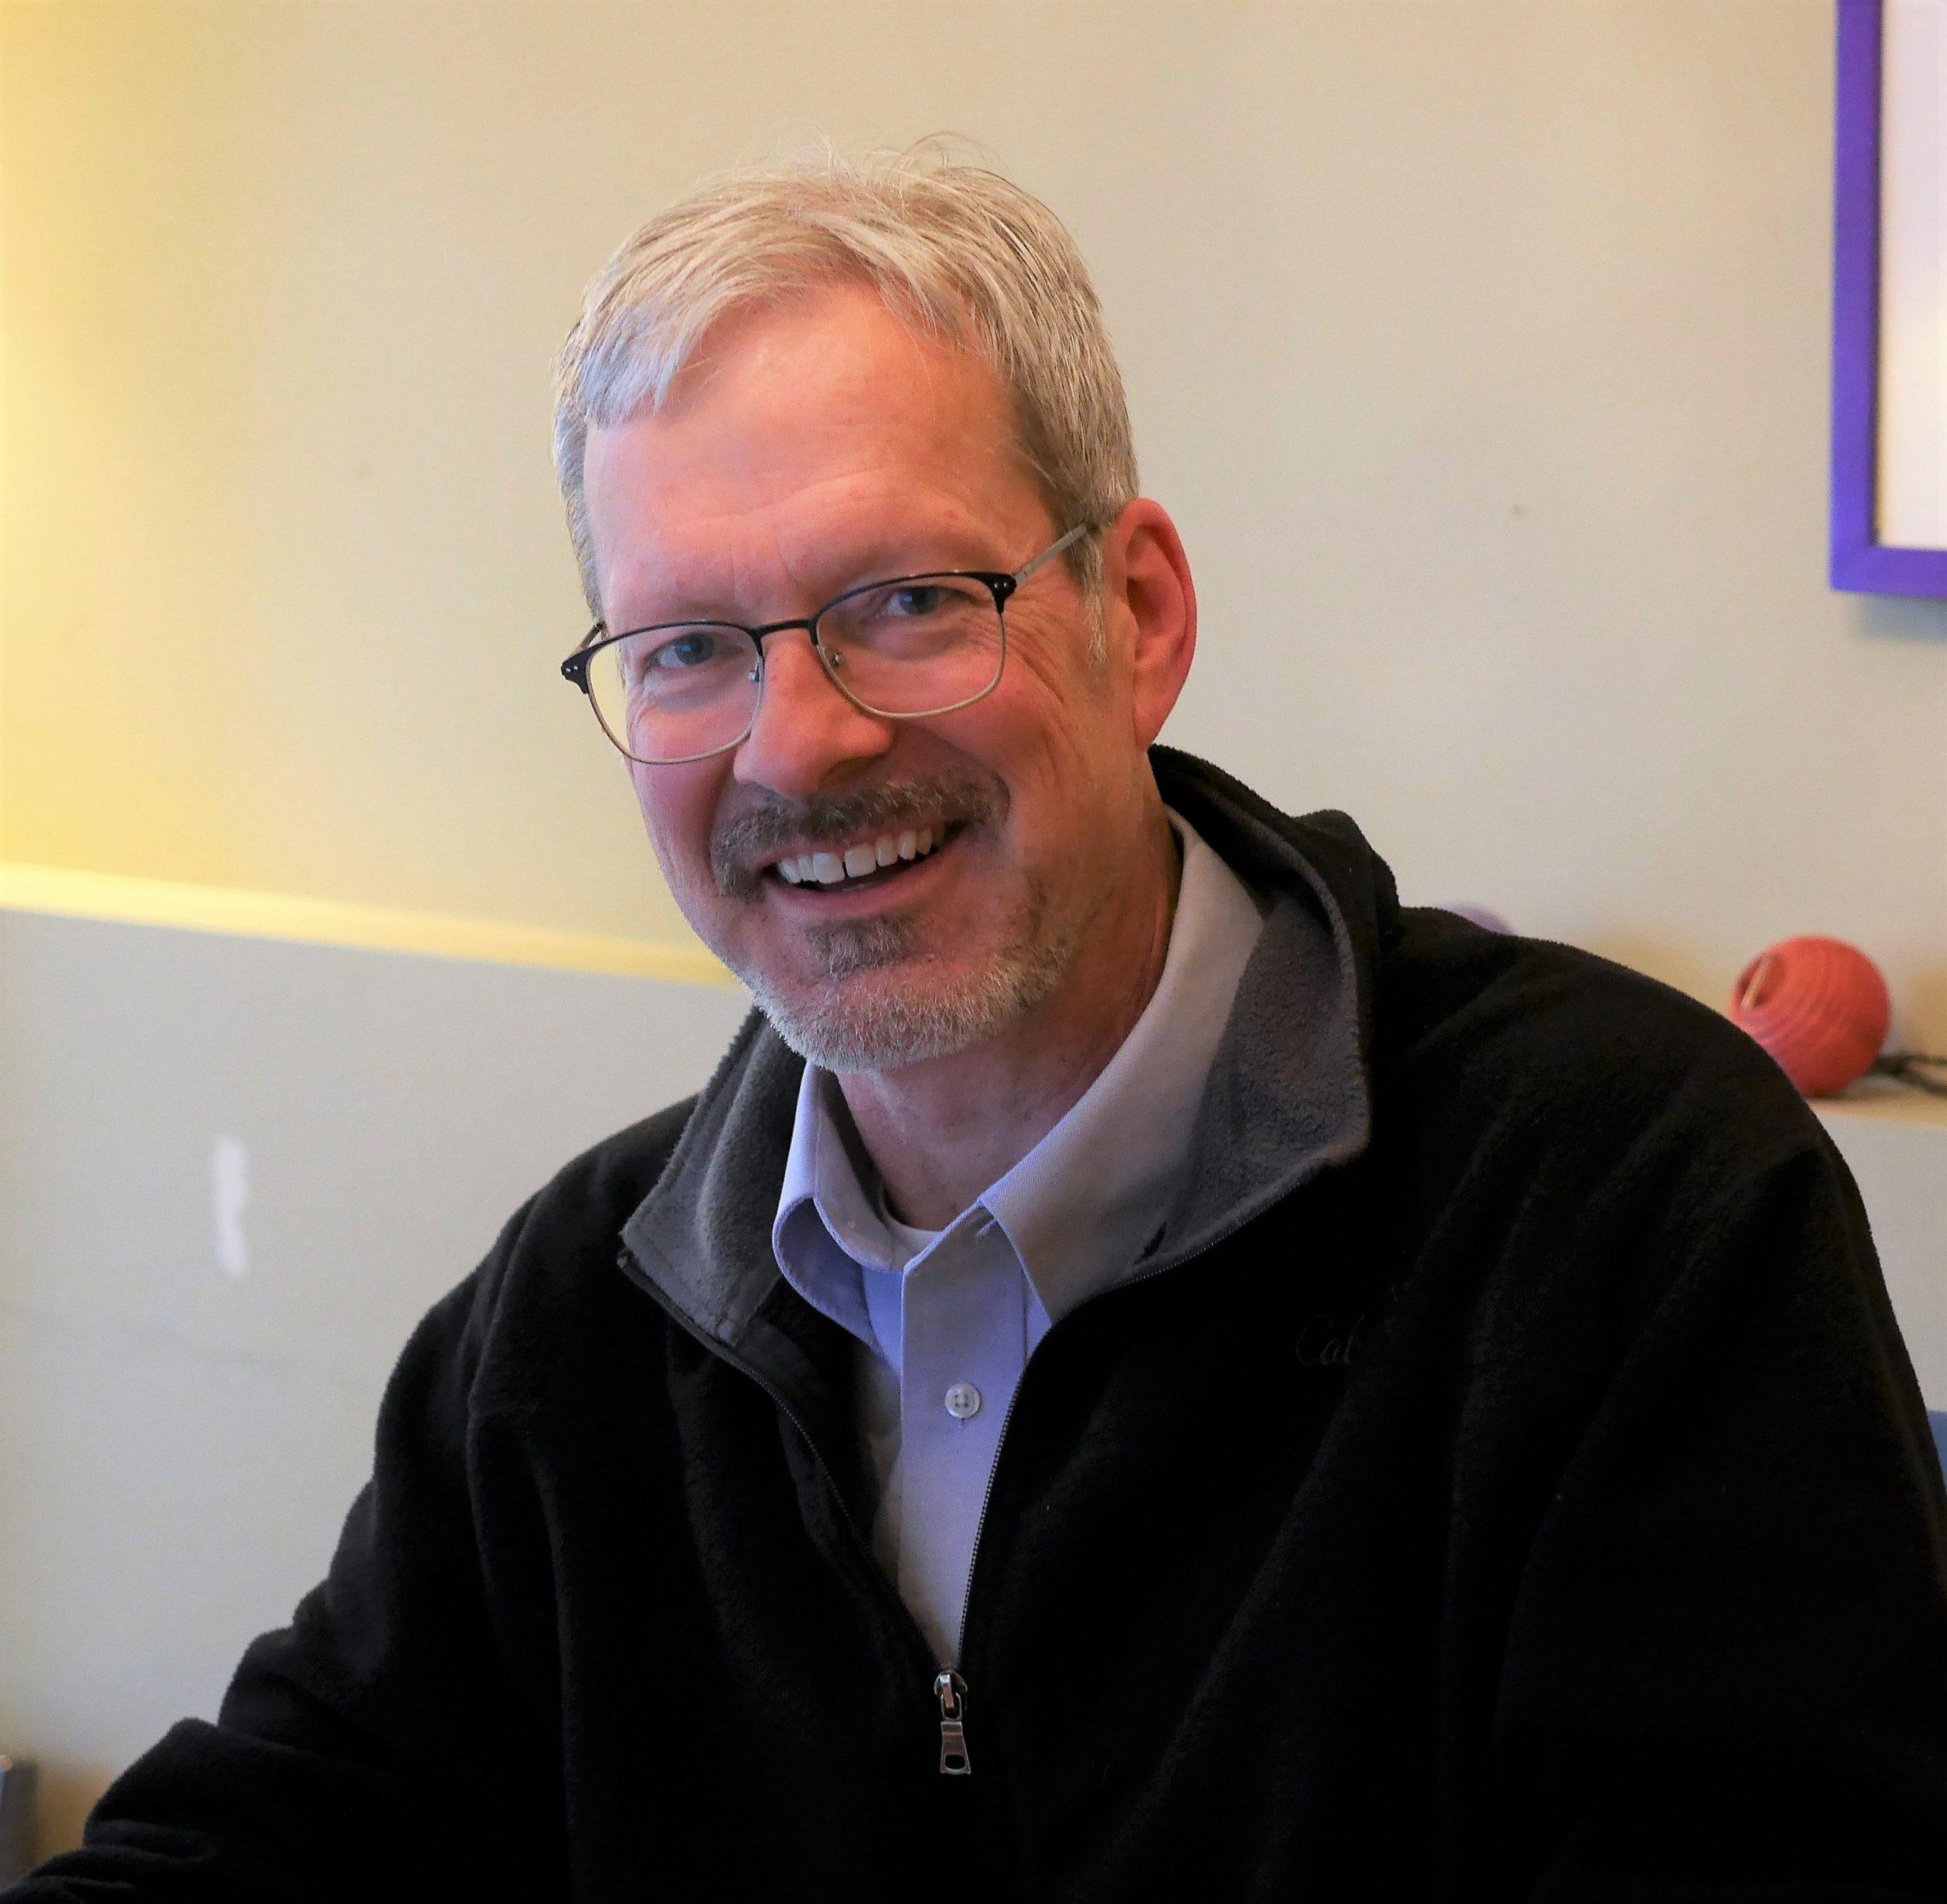 Greg Schroyer, Senior Accountant